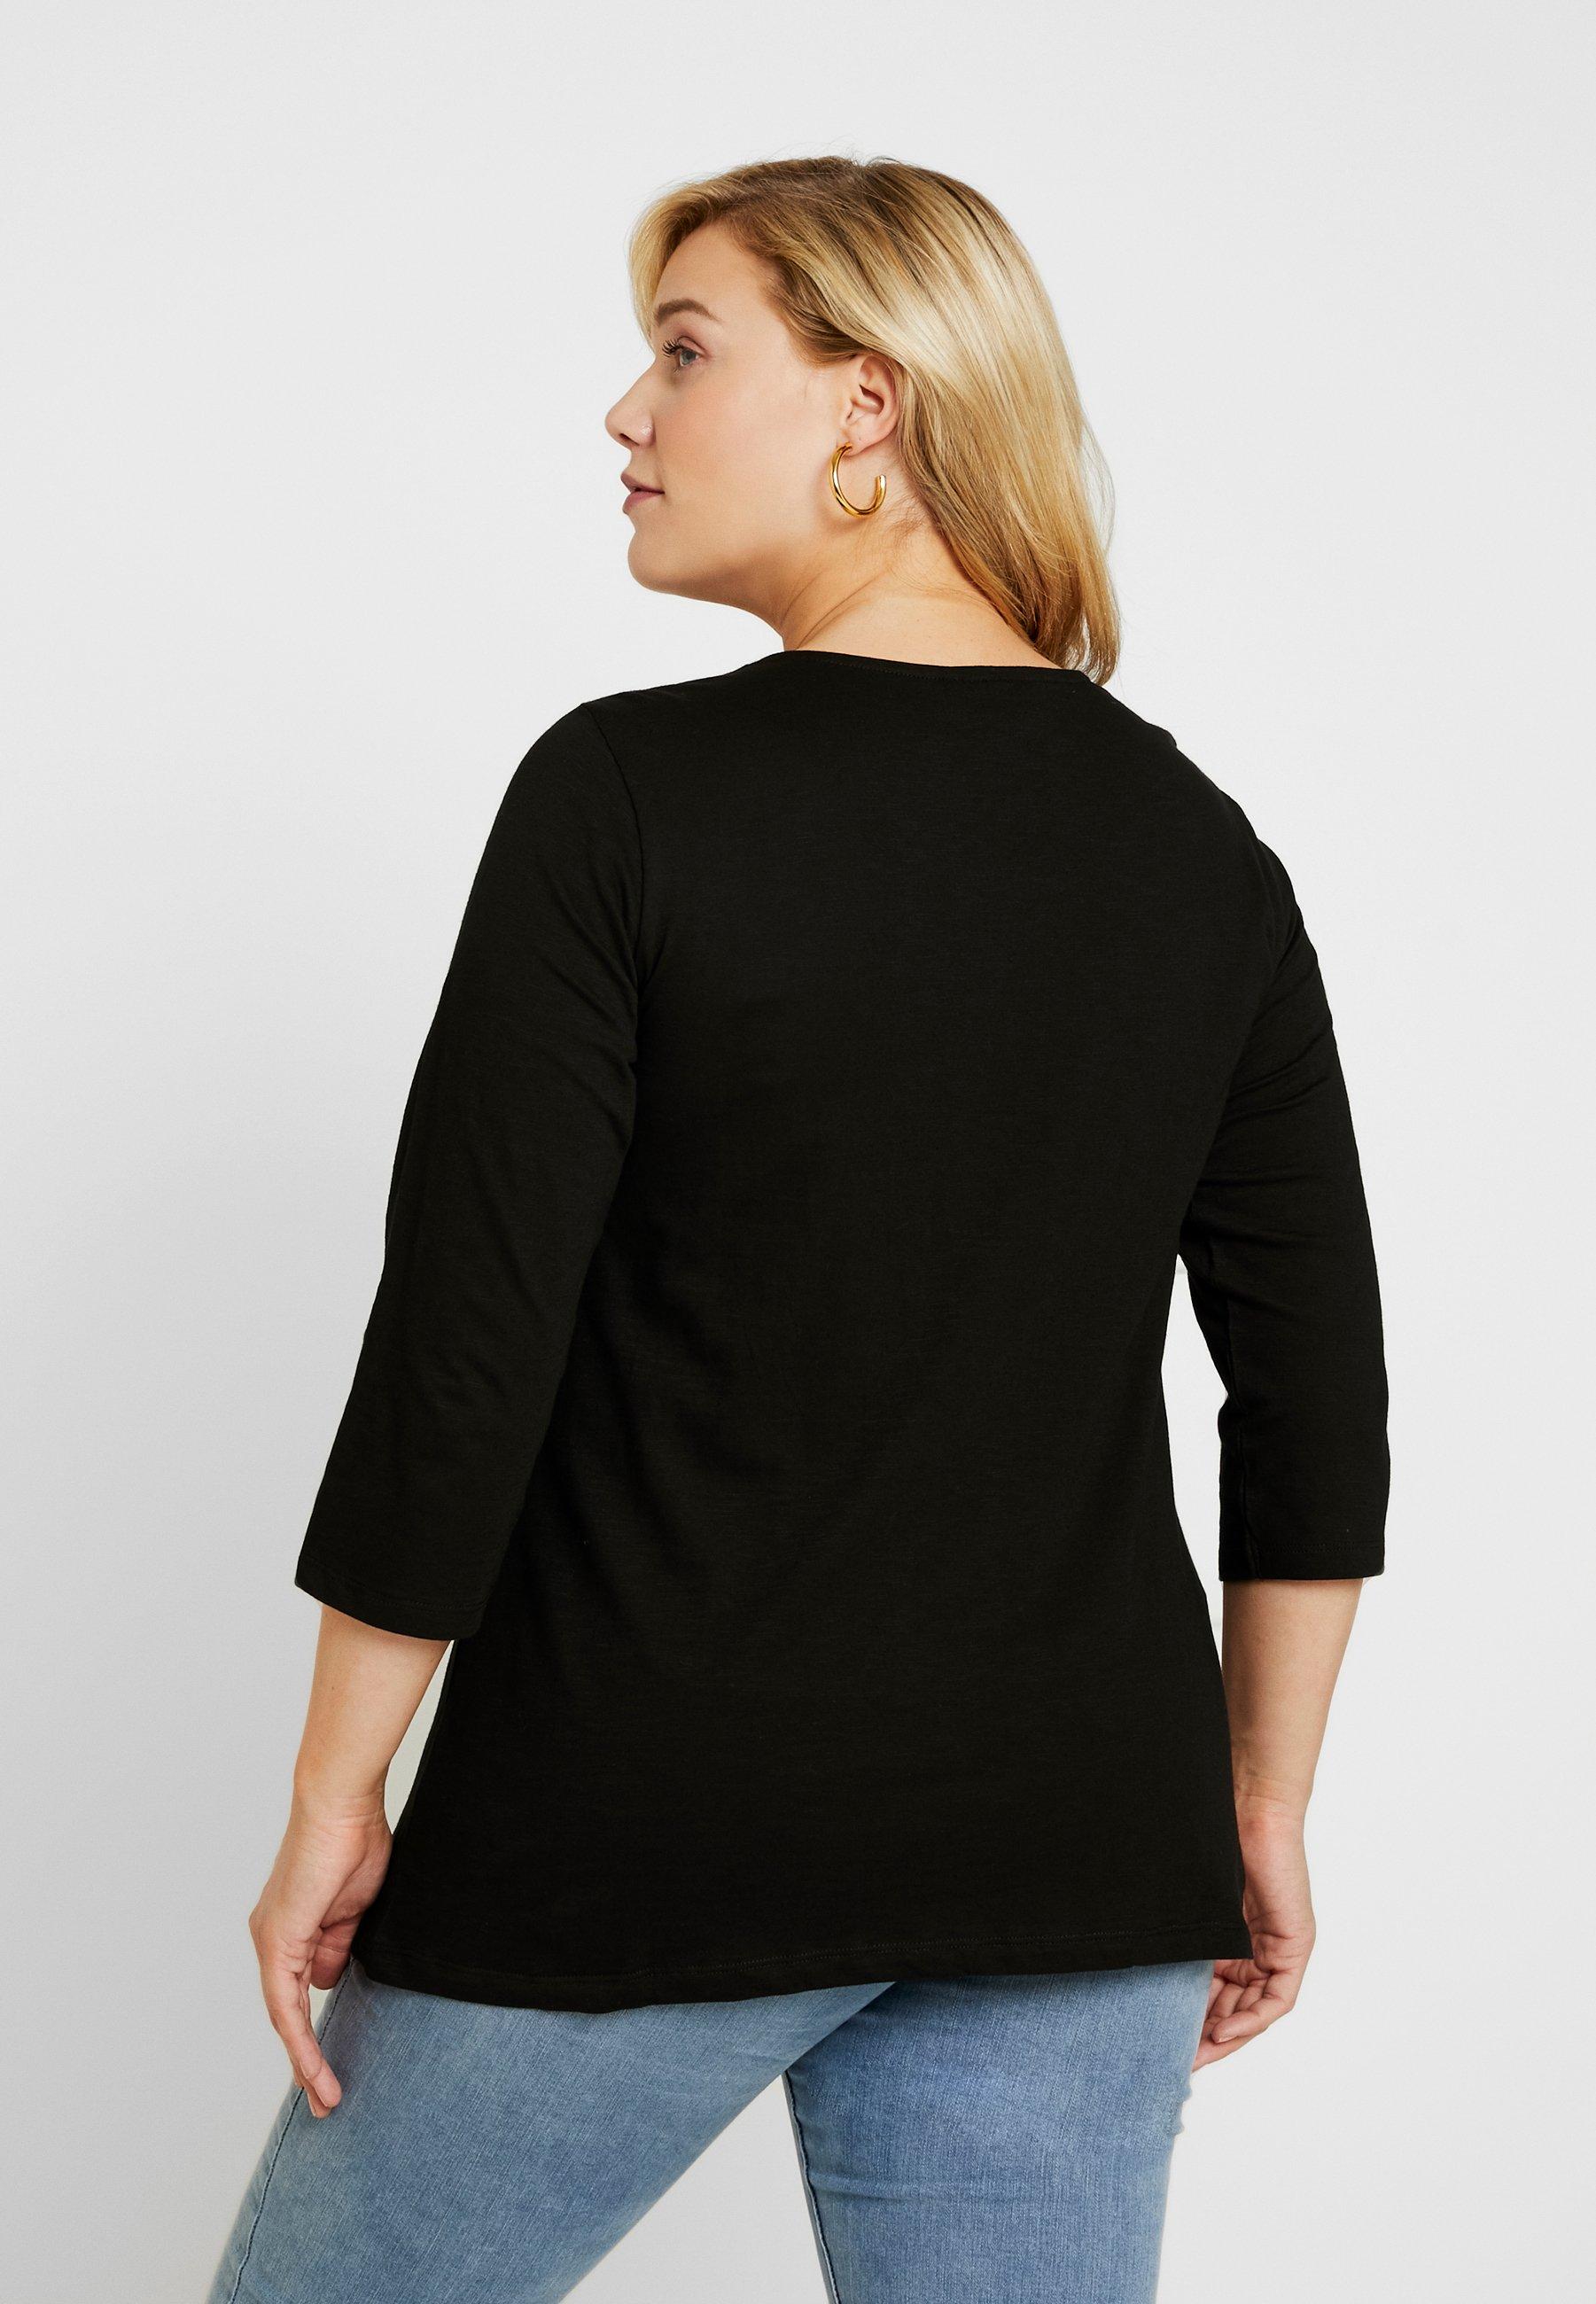 shirt Black À Holly Zizzi Longues Manches TrimT Ladder kZTwOuPiX